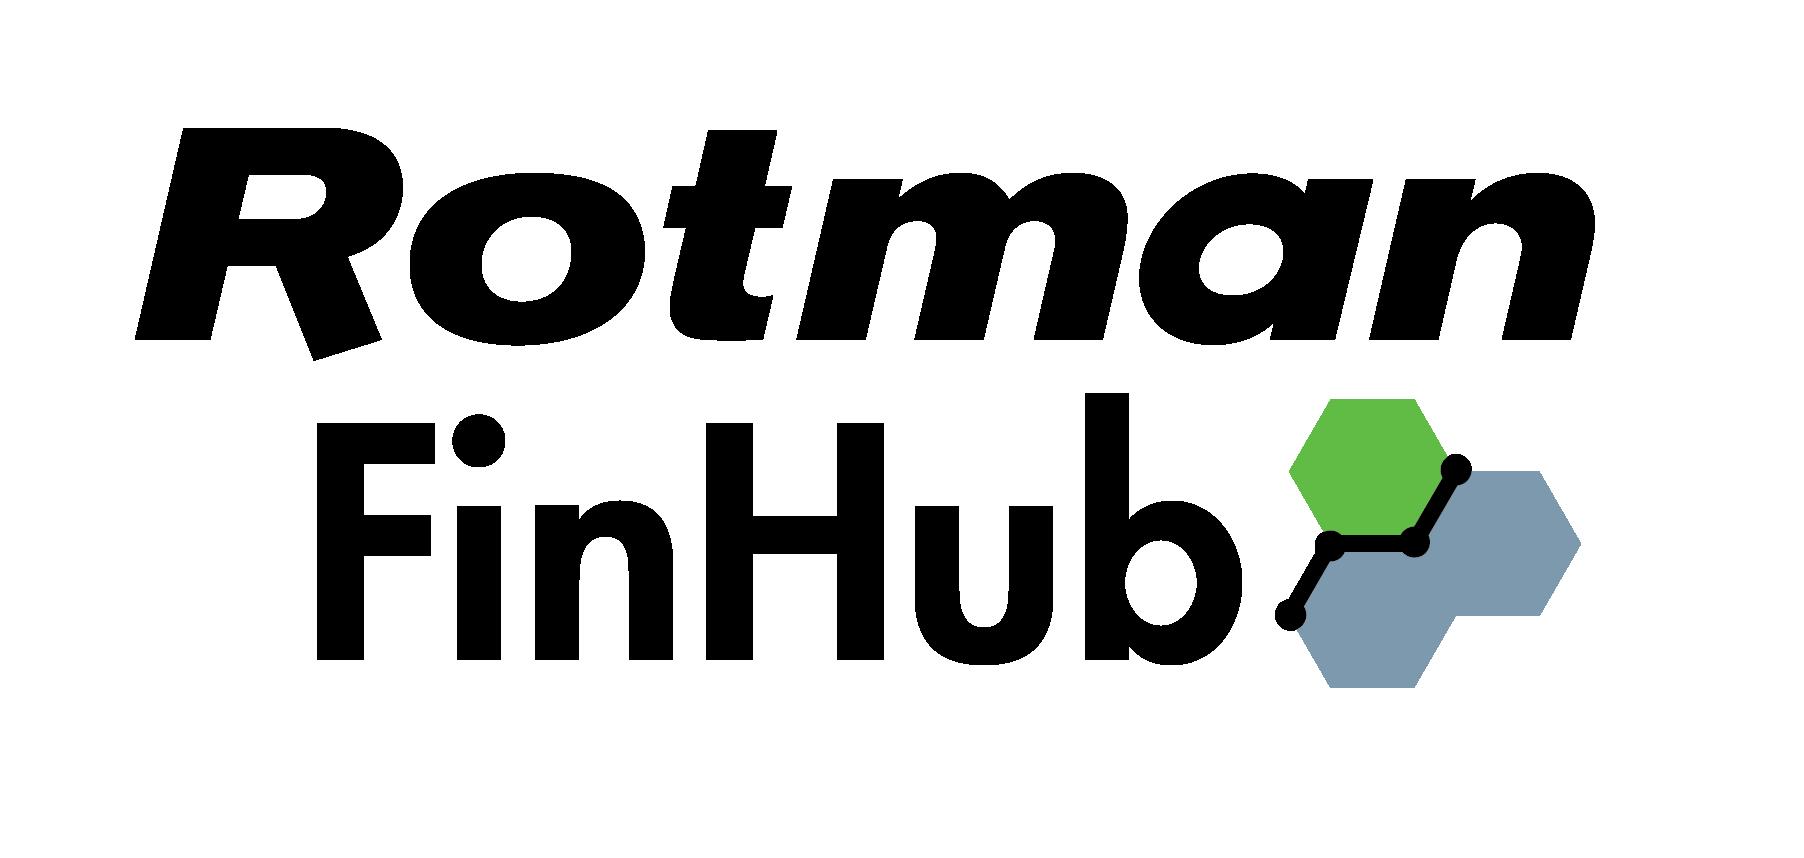 Rotman Finhub Financial Innovation Hub In Advanced Analytics